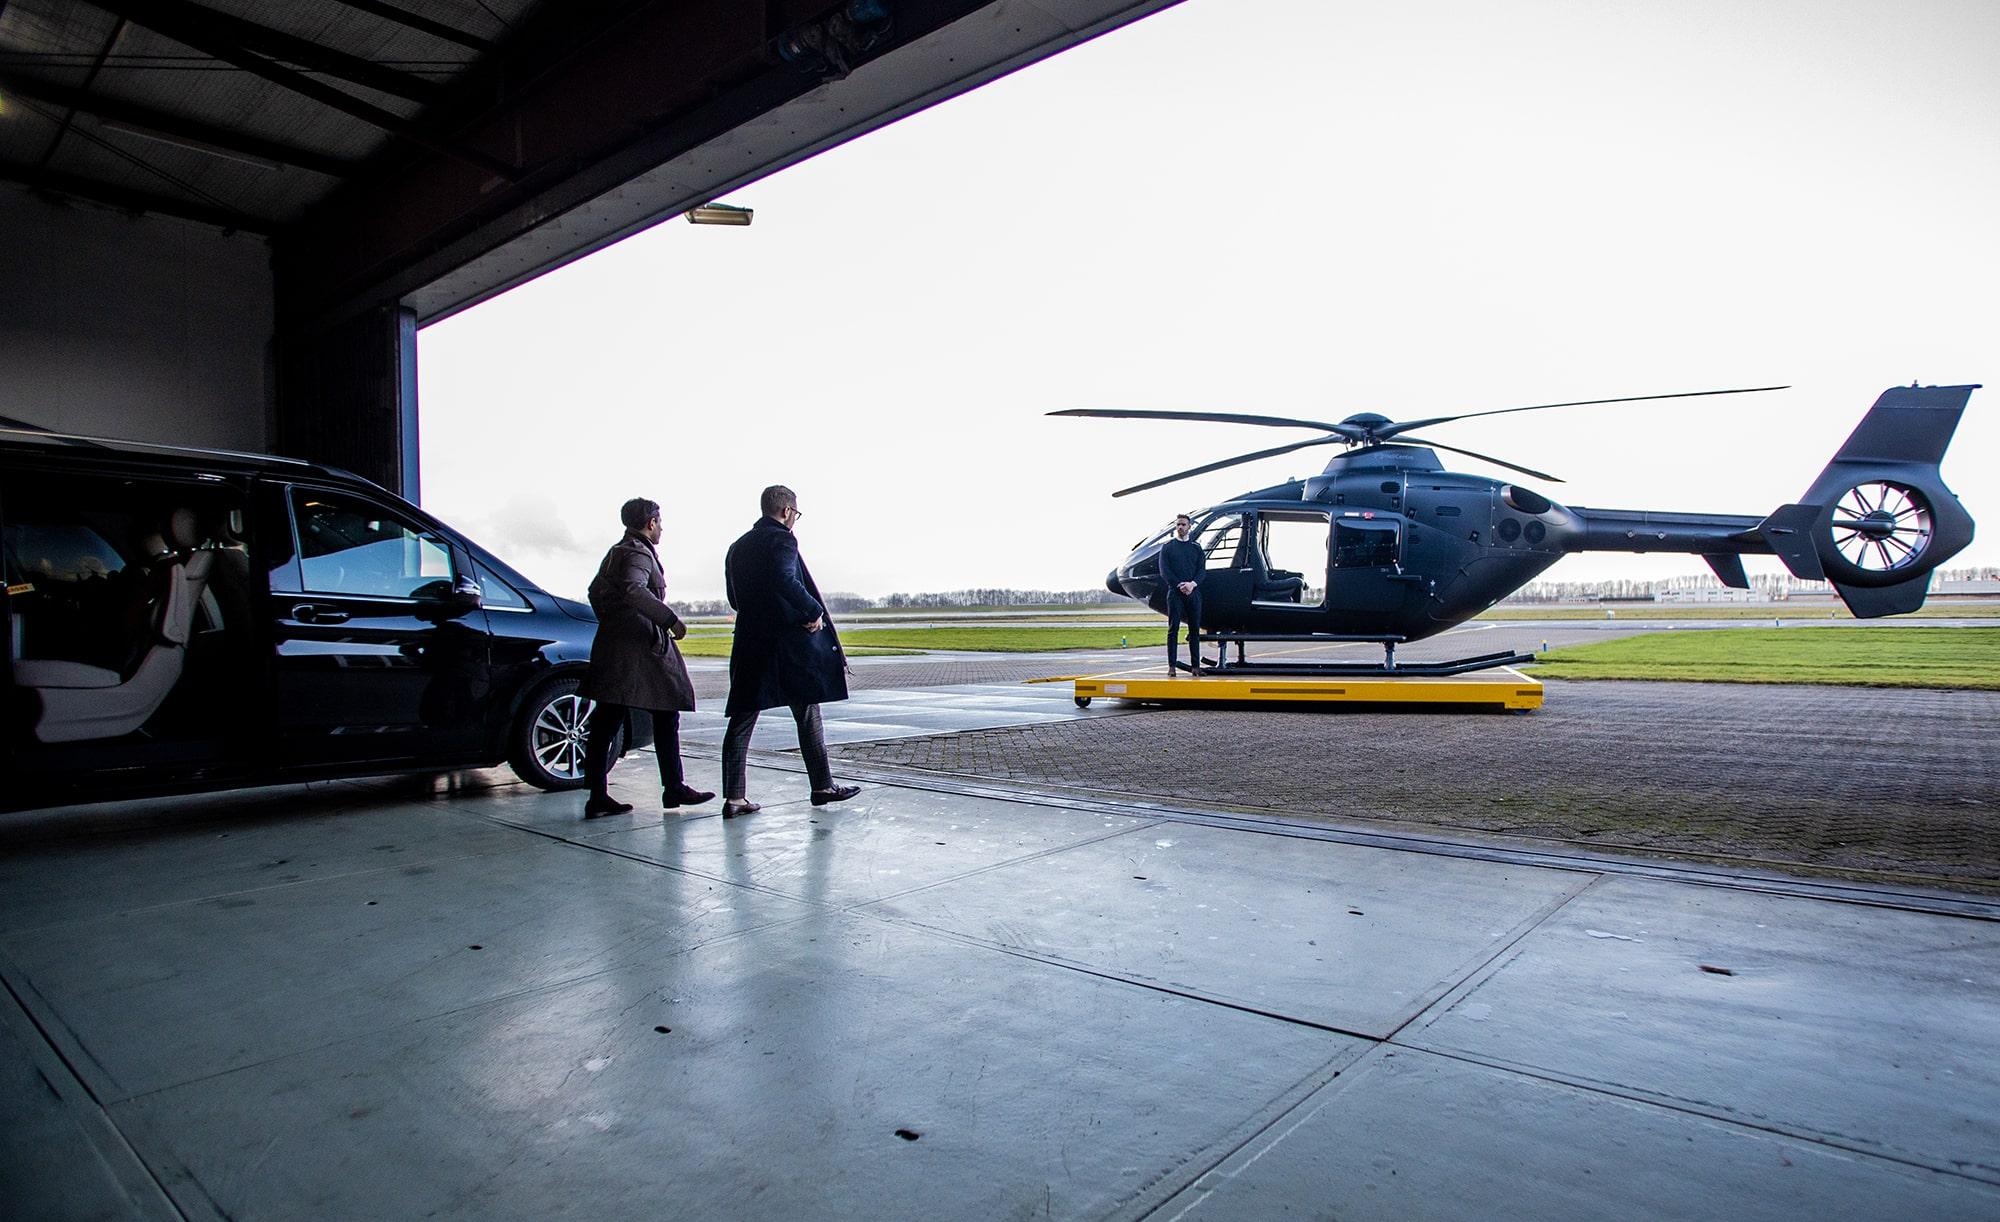 Helikopter huren | Helicopter charter | Infinite Risks